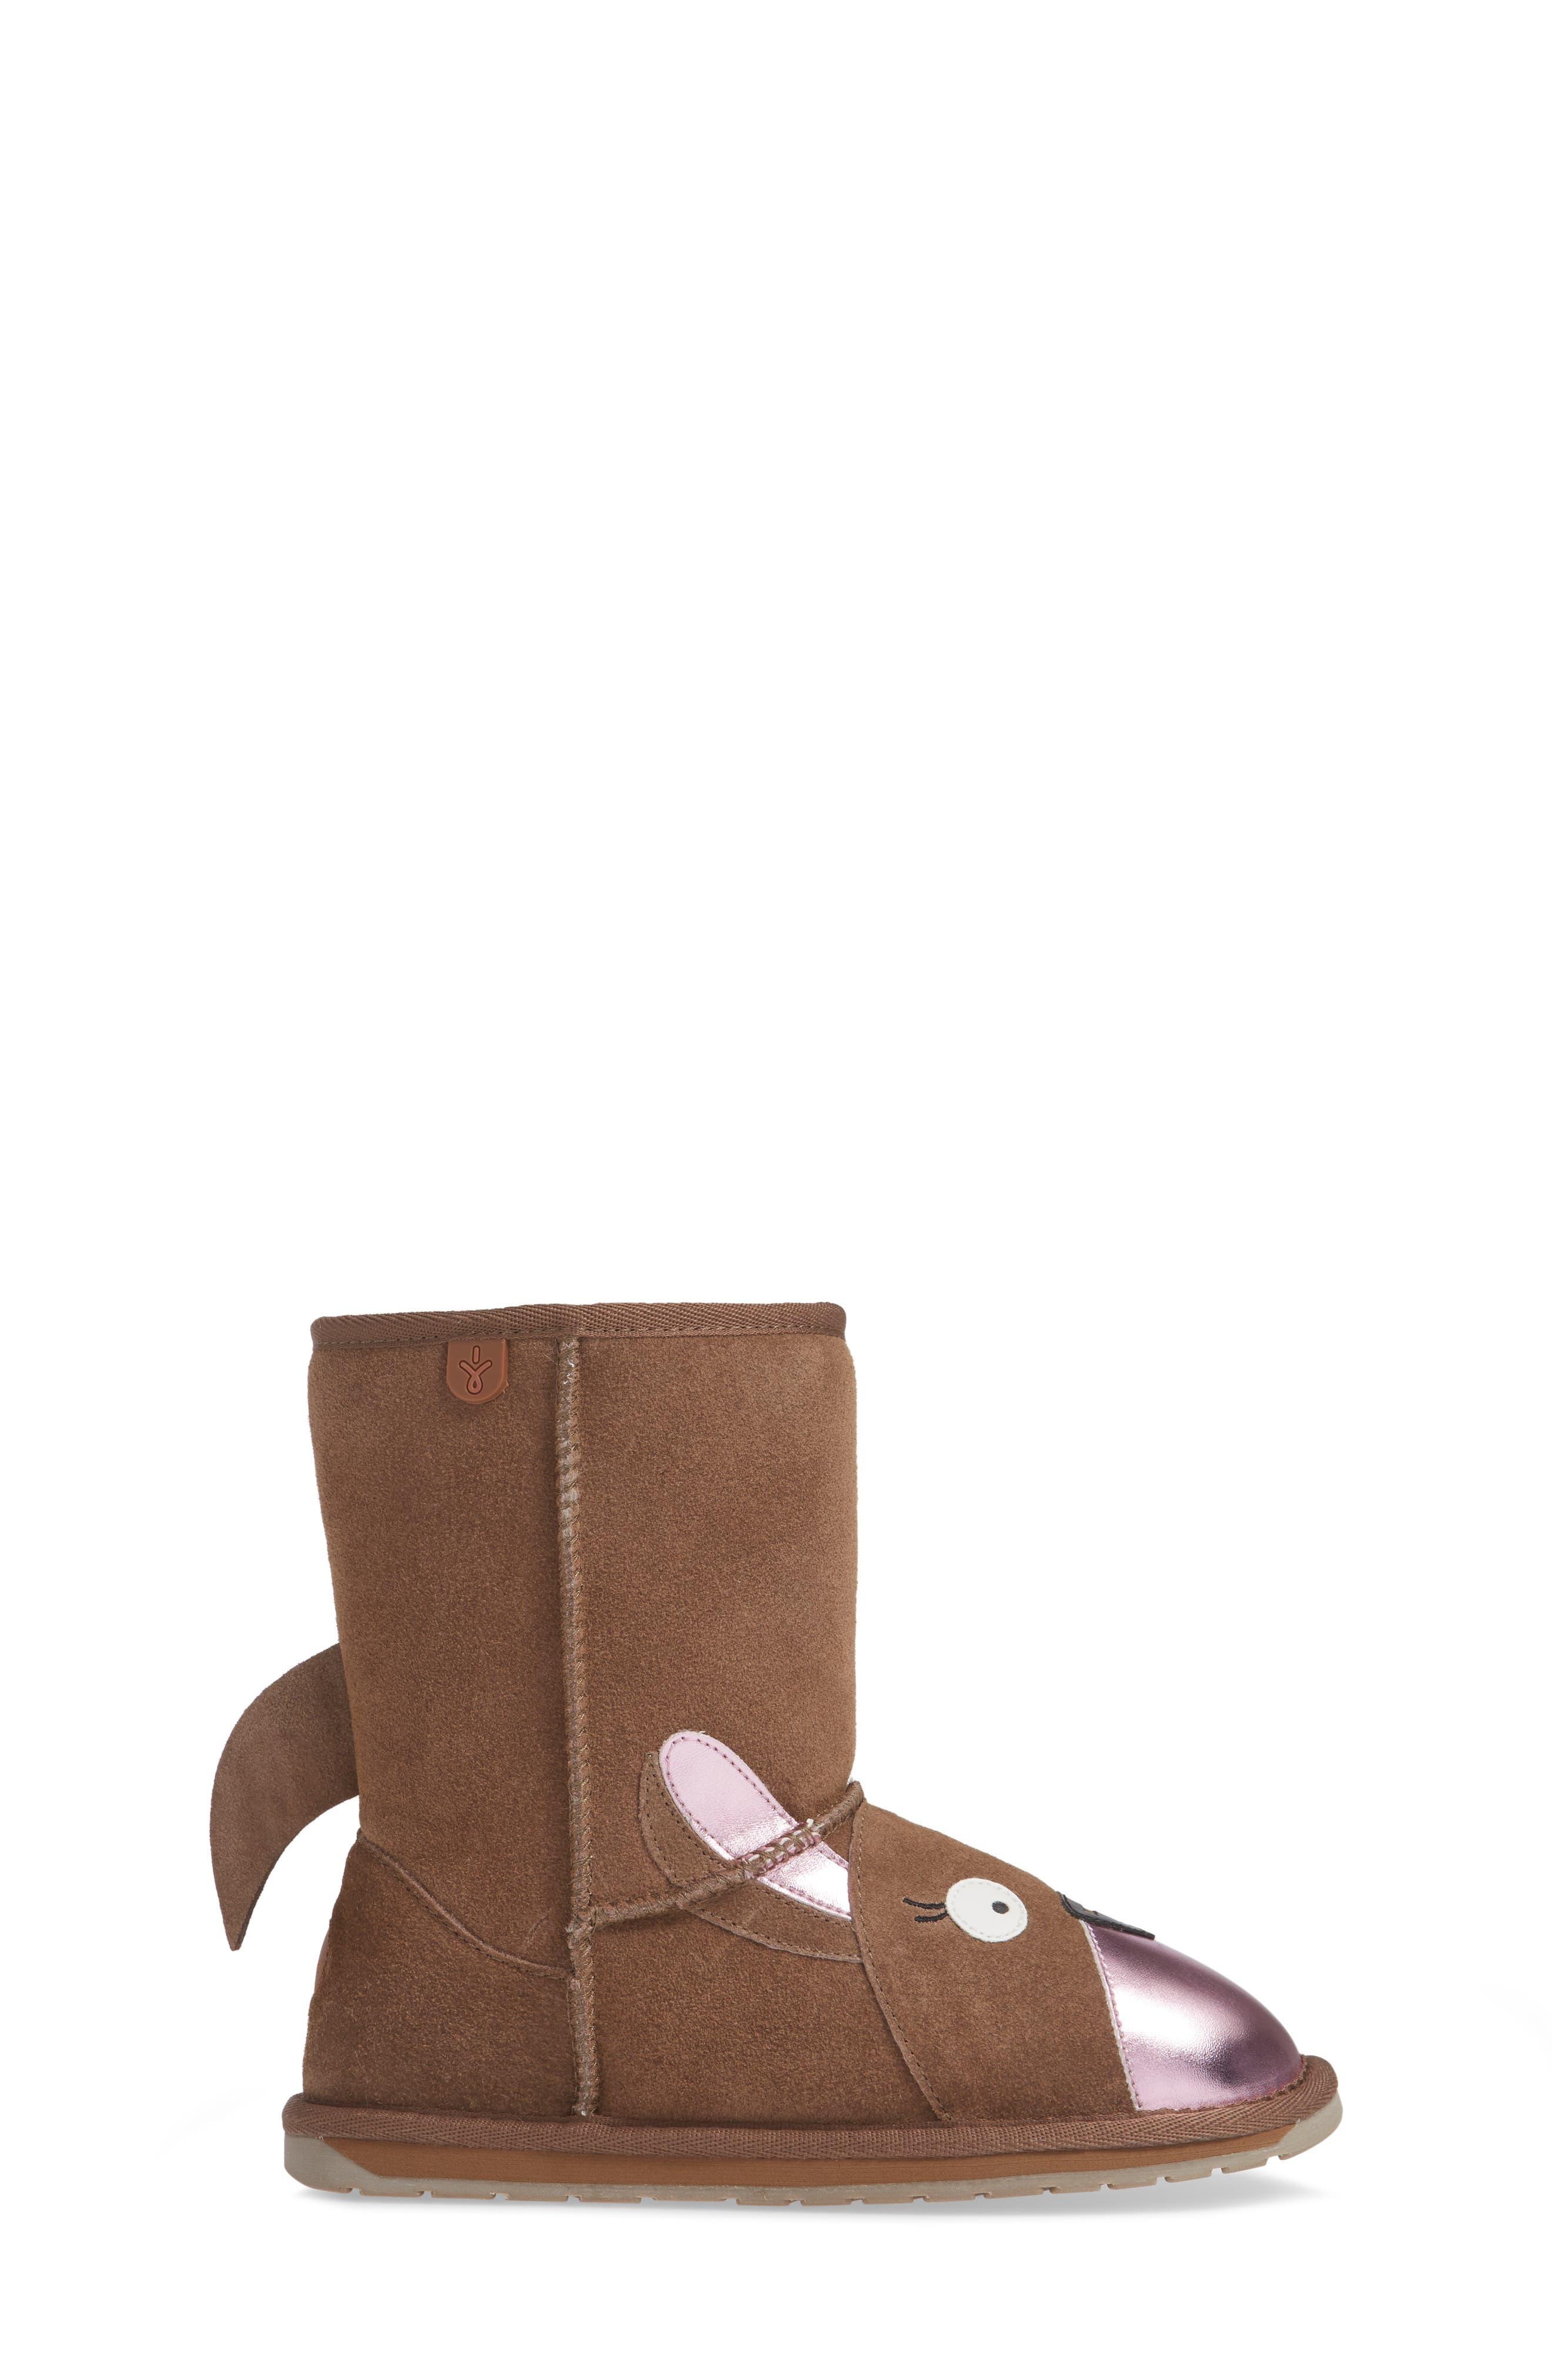 Kanga Wool Lined Boot,                             Alternate thumbnail 3, color,                             OAK